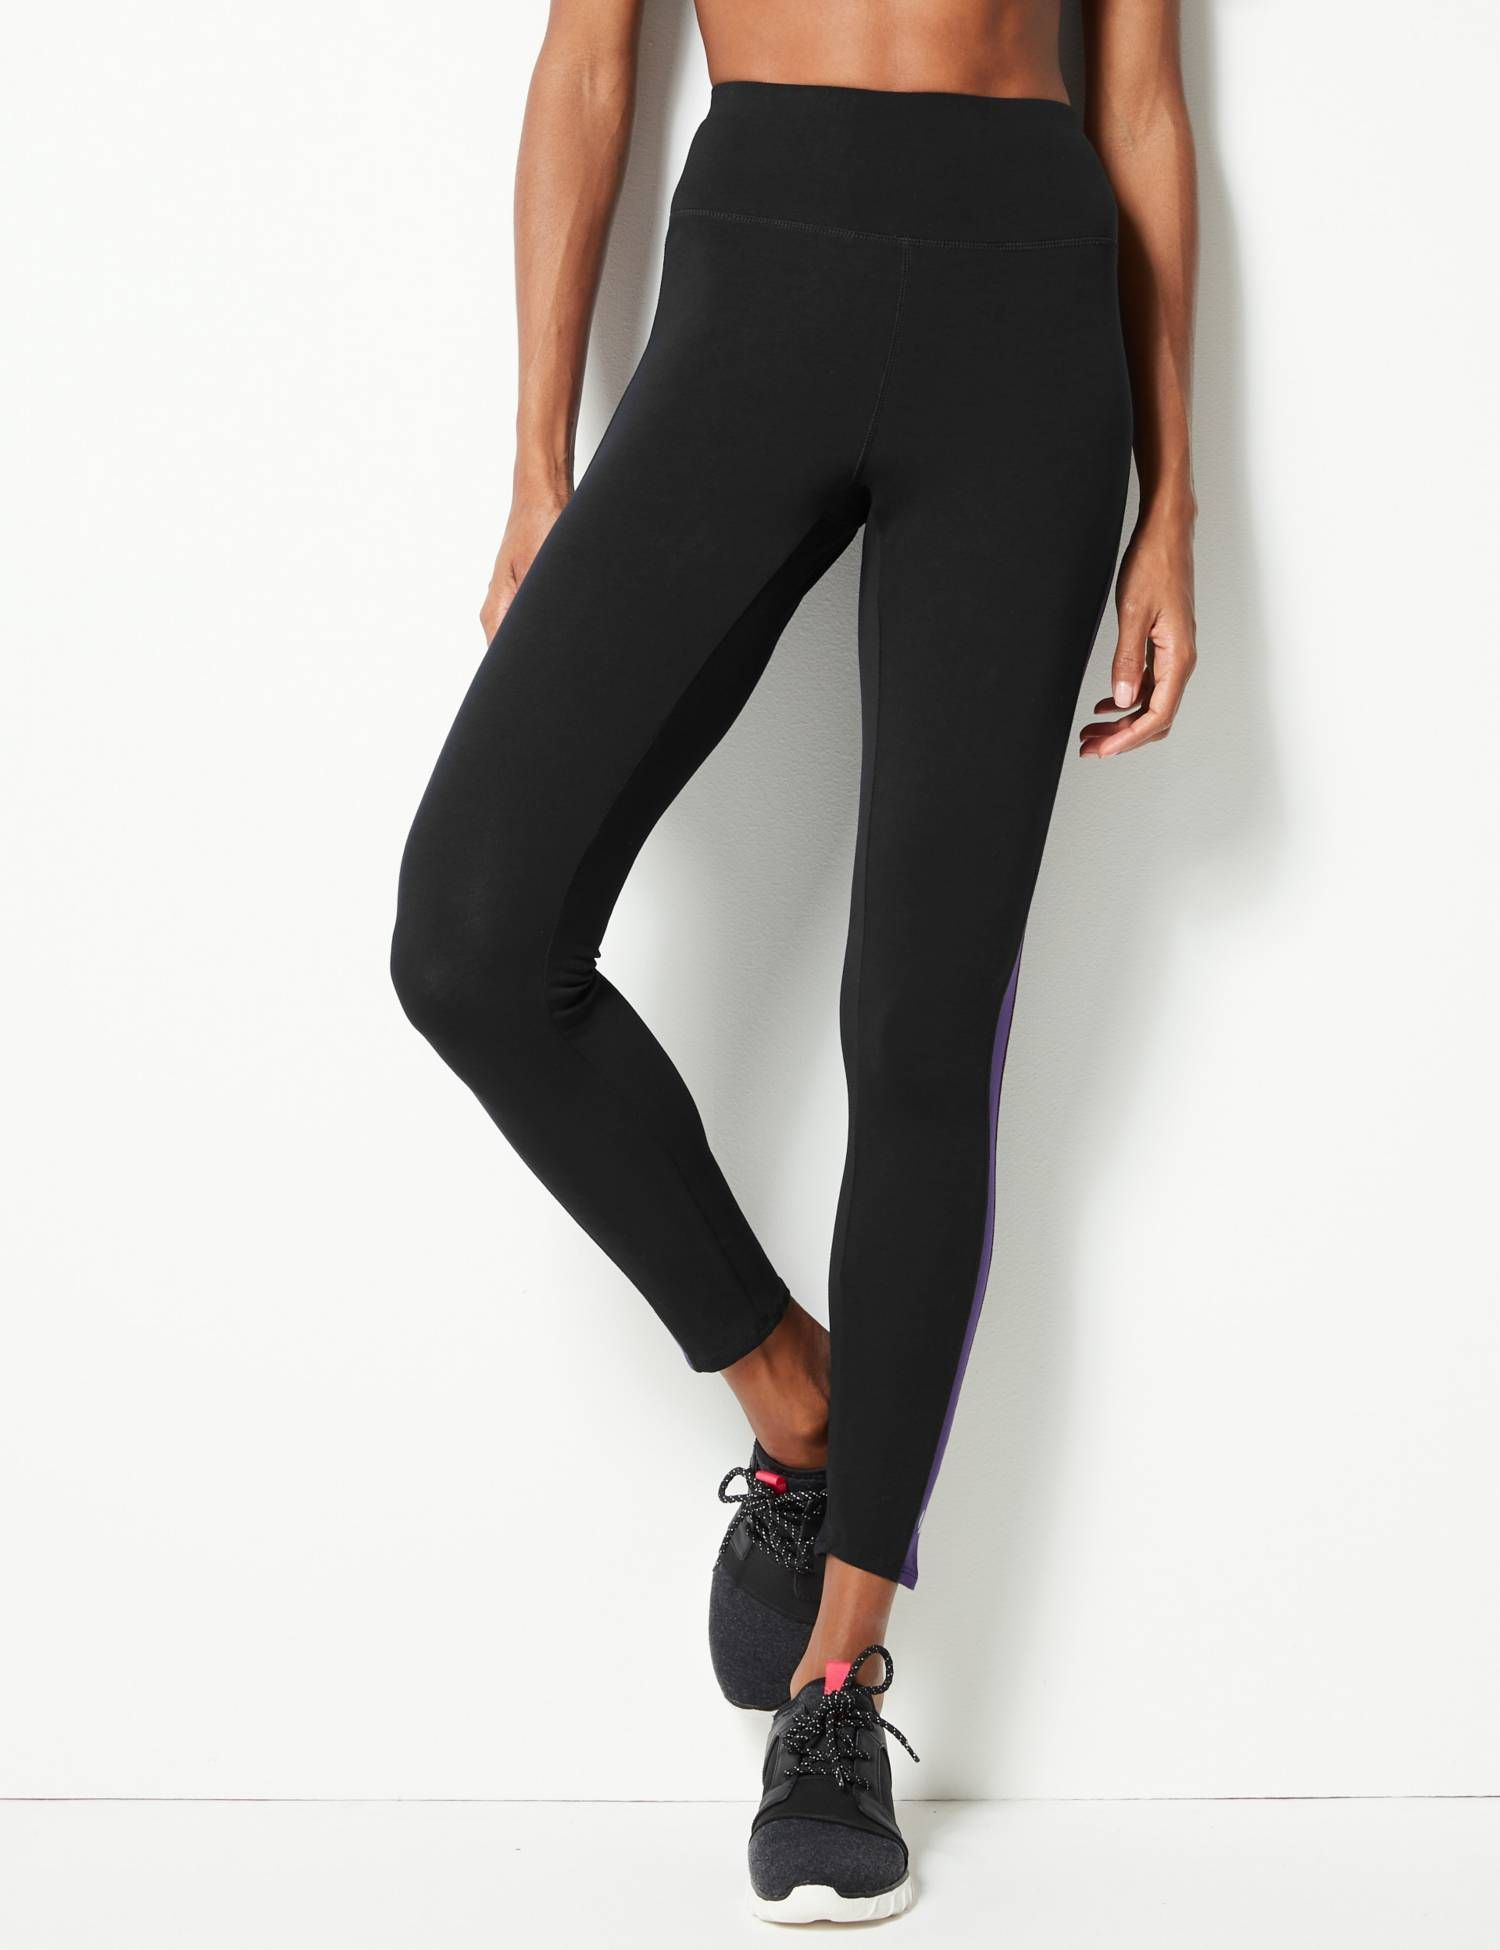 M&S workout leggings